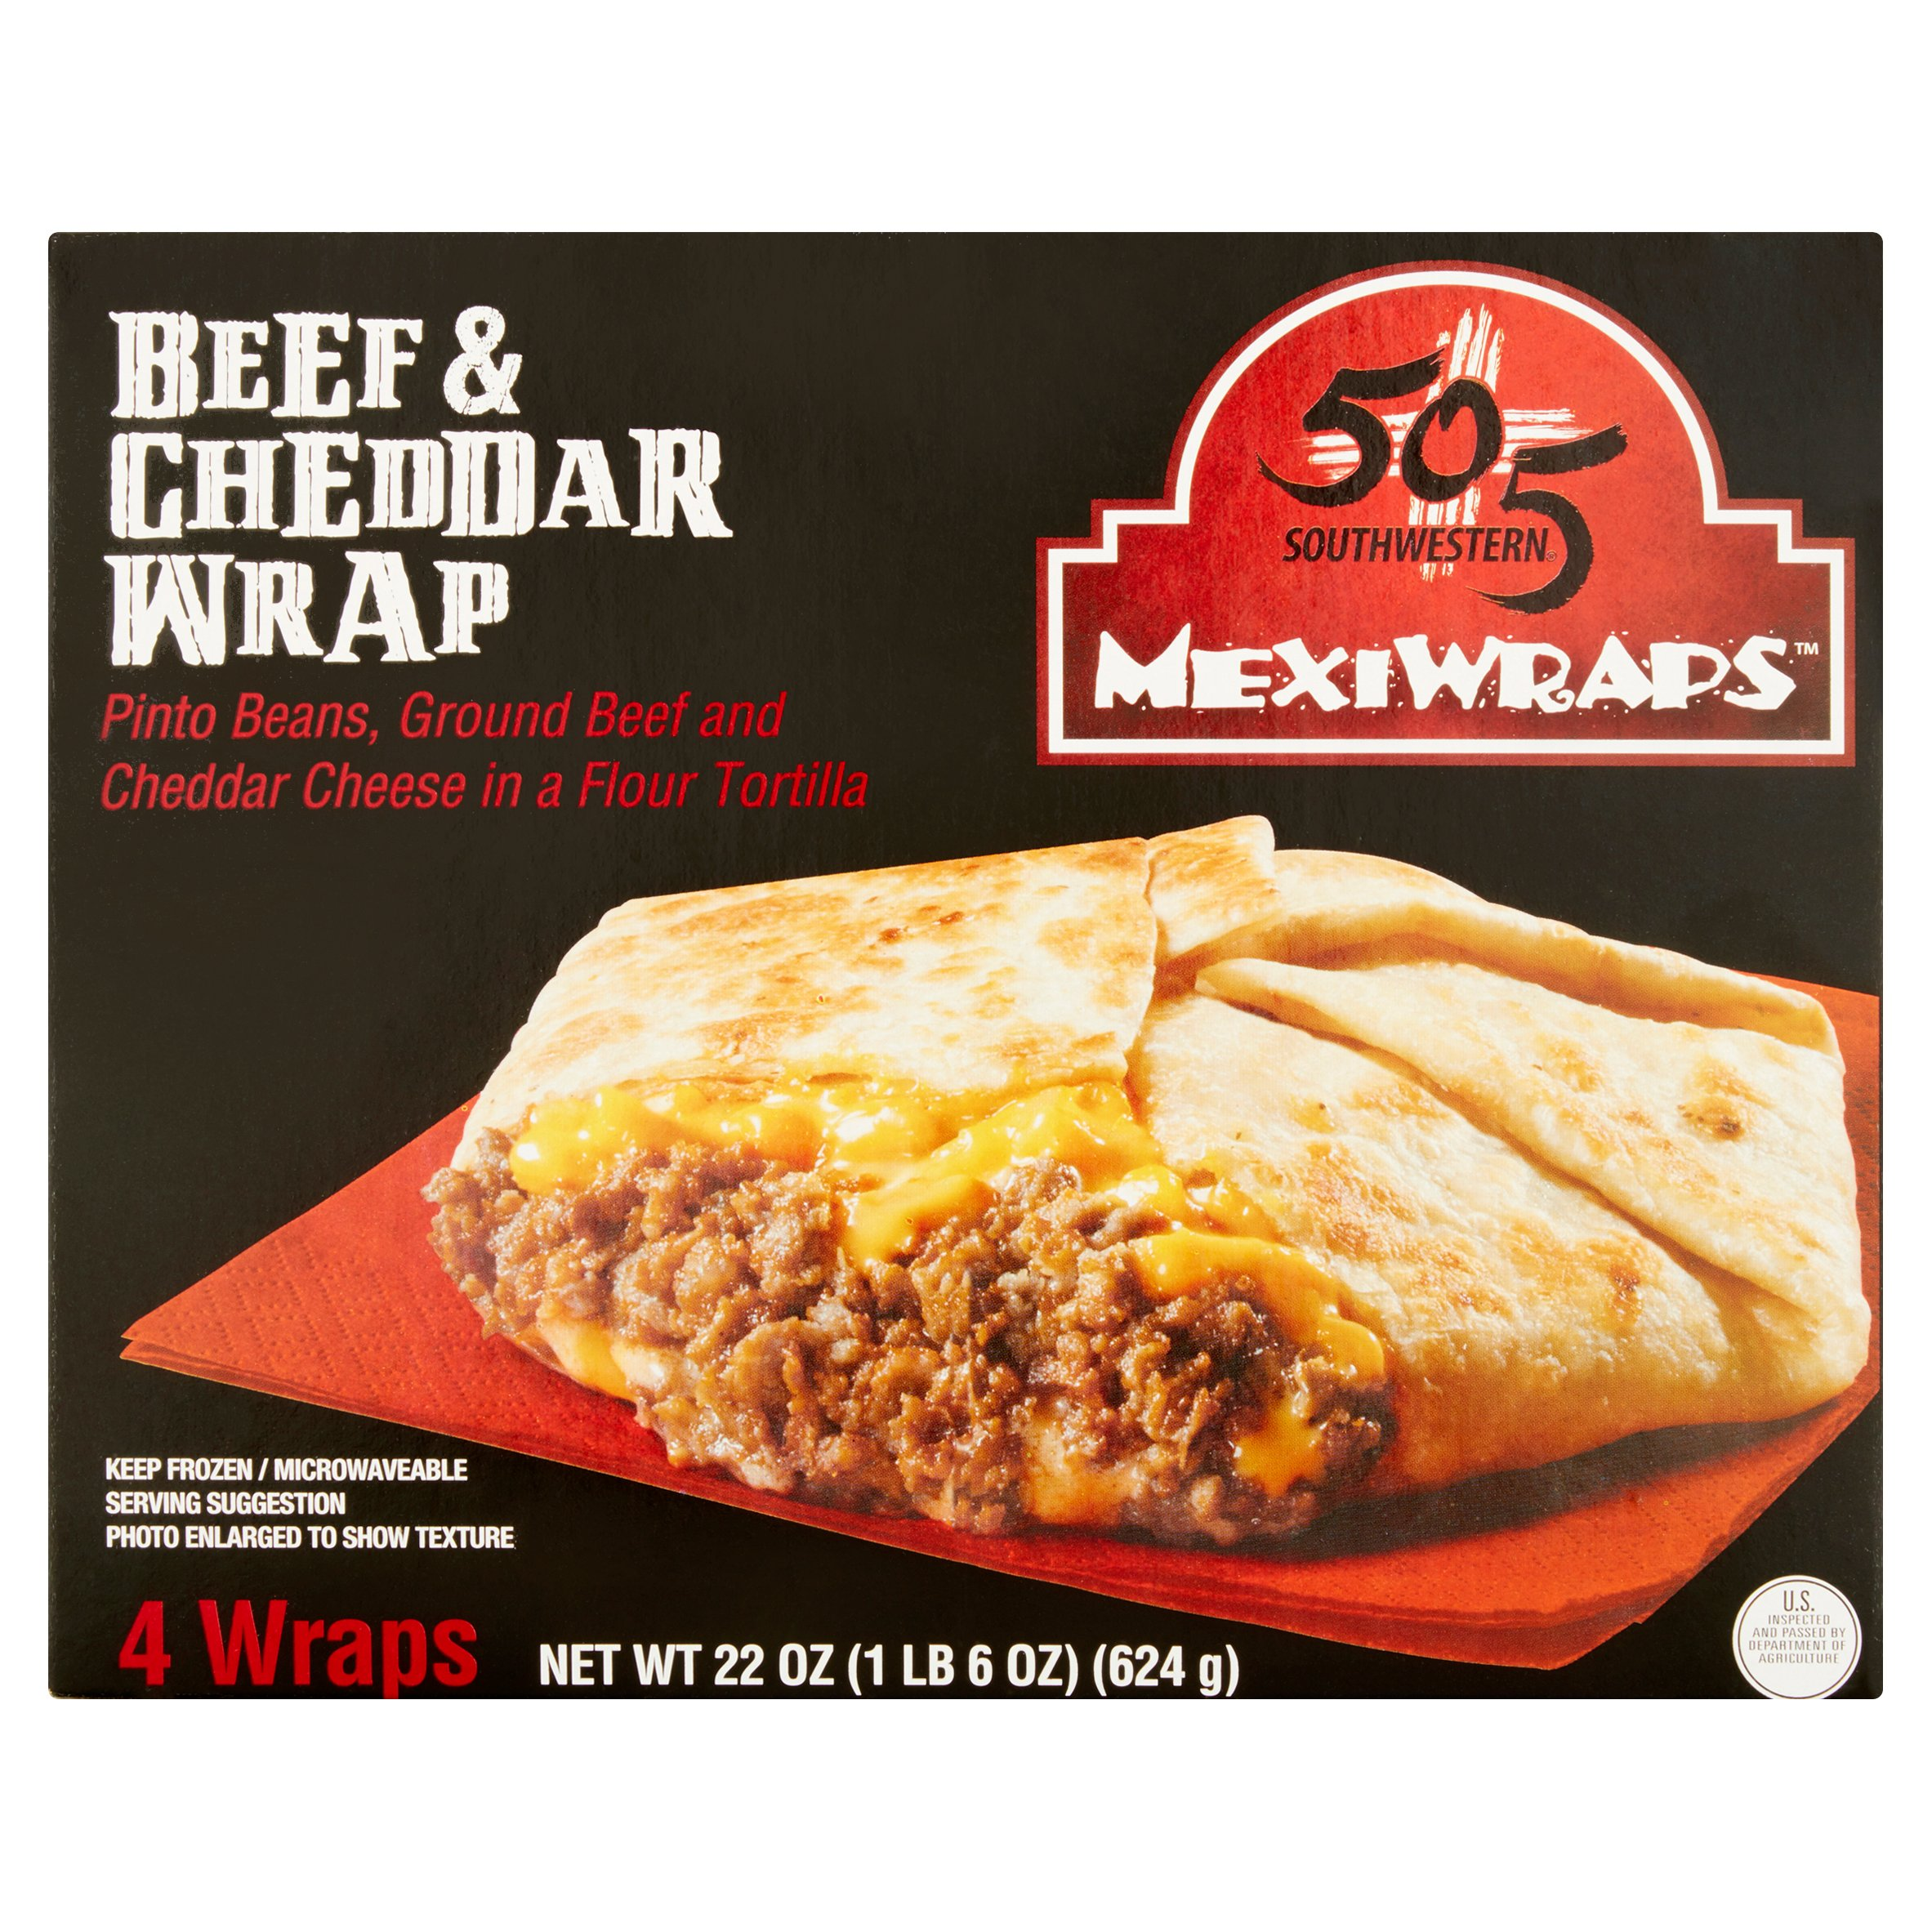 505 Southwestern MexiWraps Beef & Cheddar Wrap, 4 count, 5.5 oz